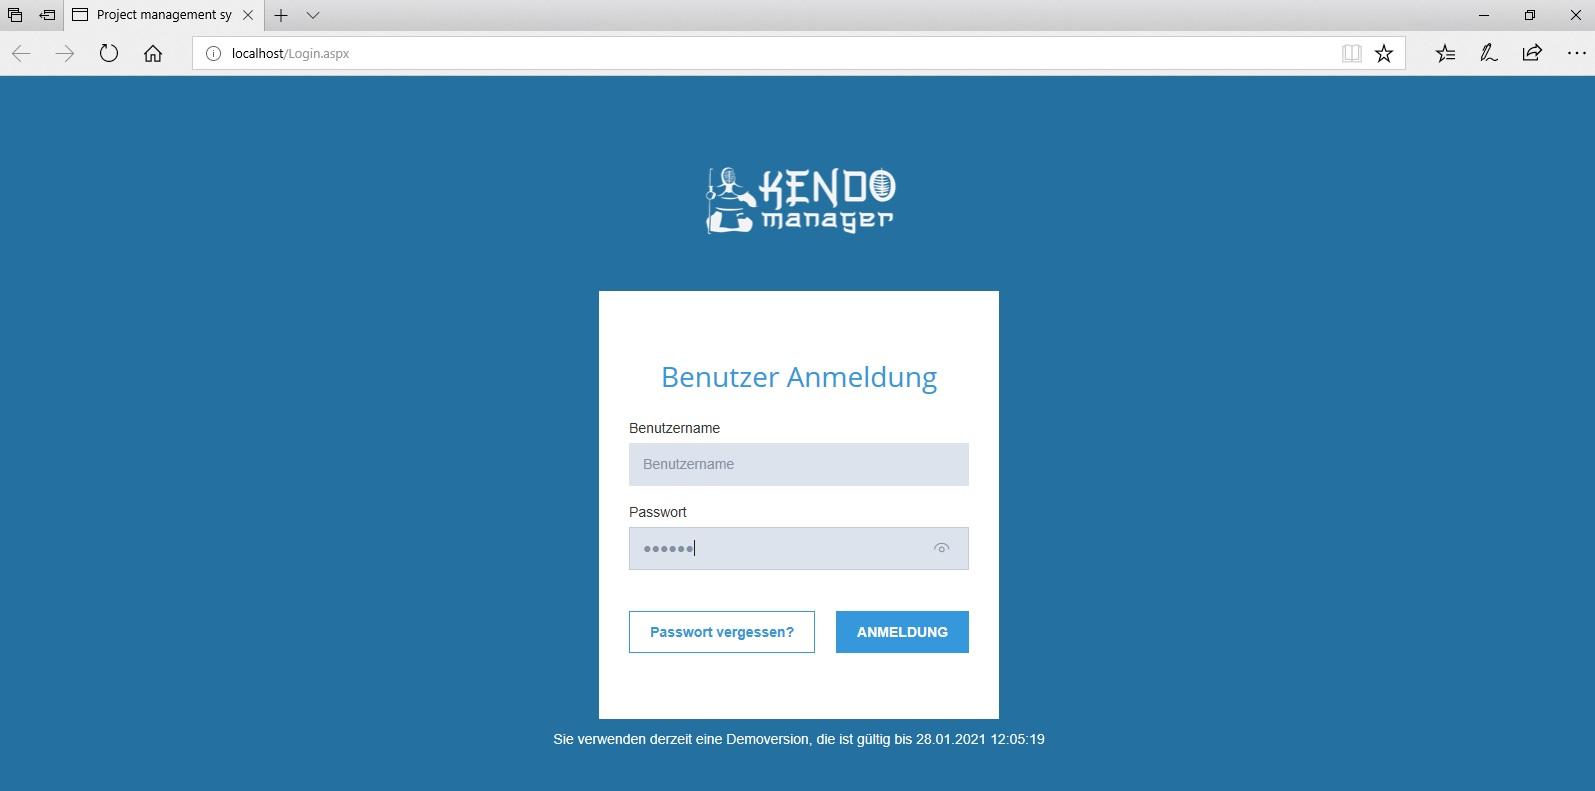 kendo_iis_login